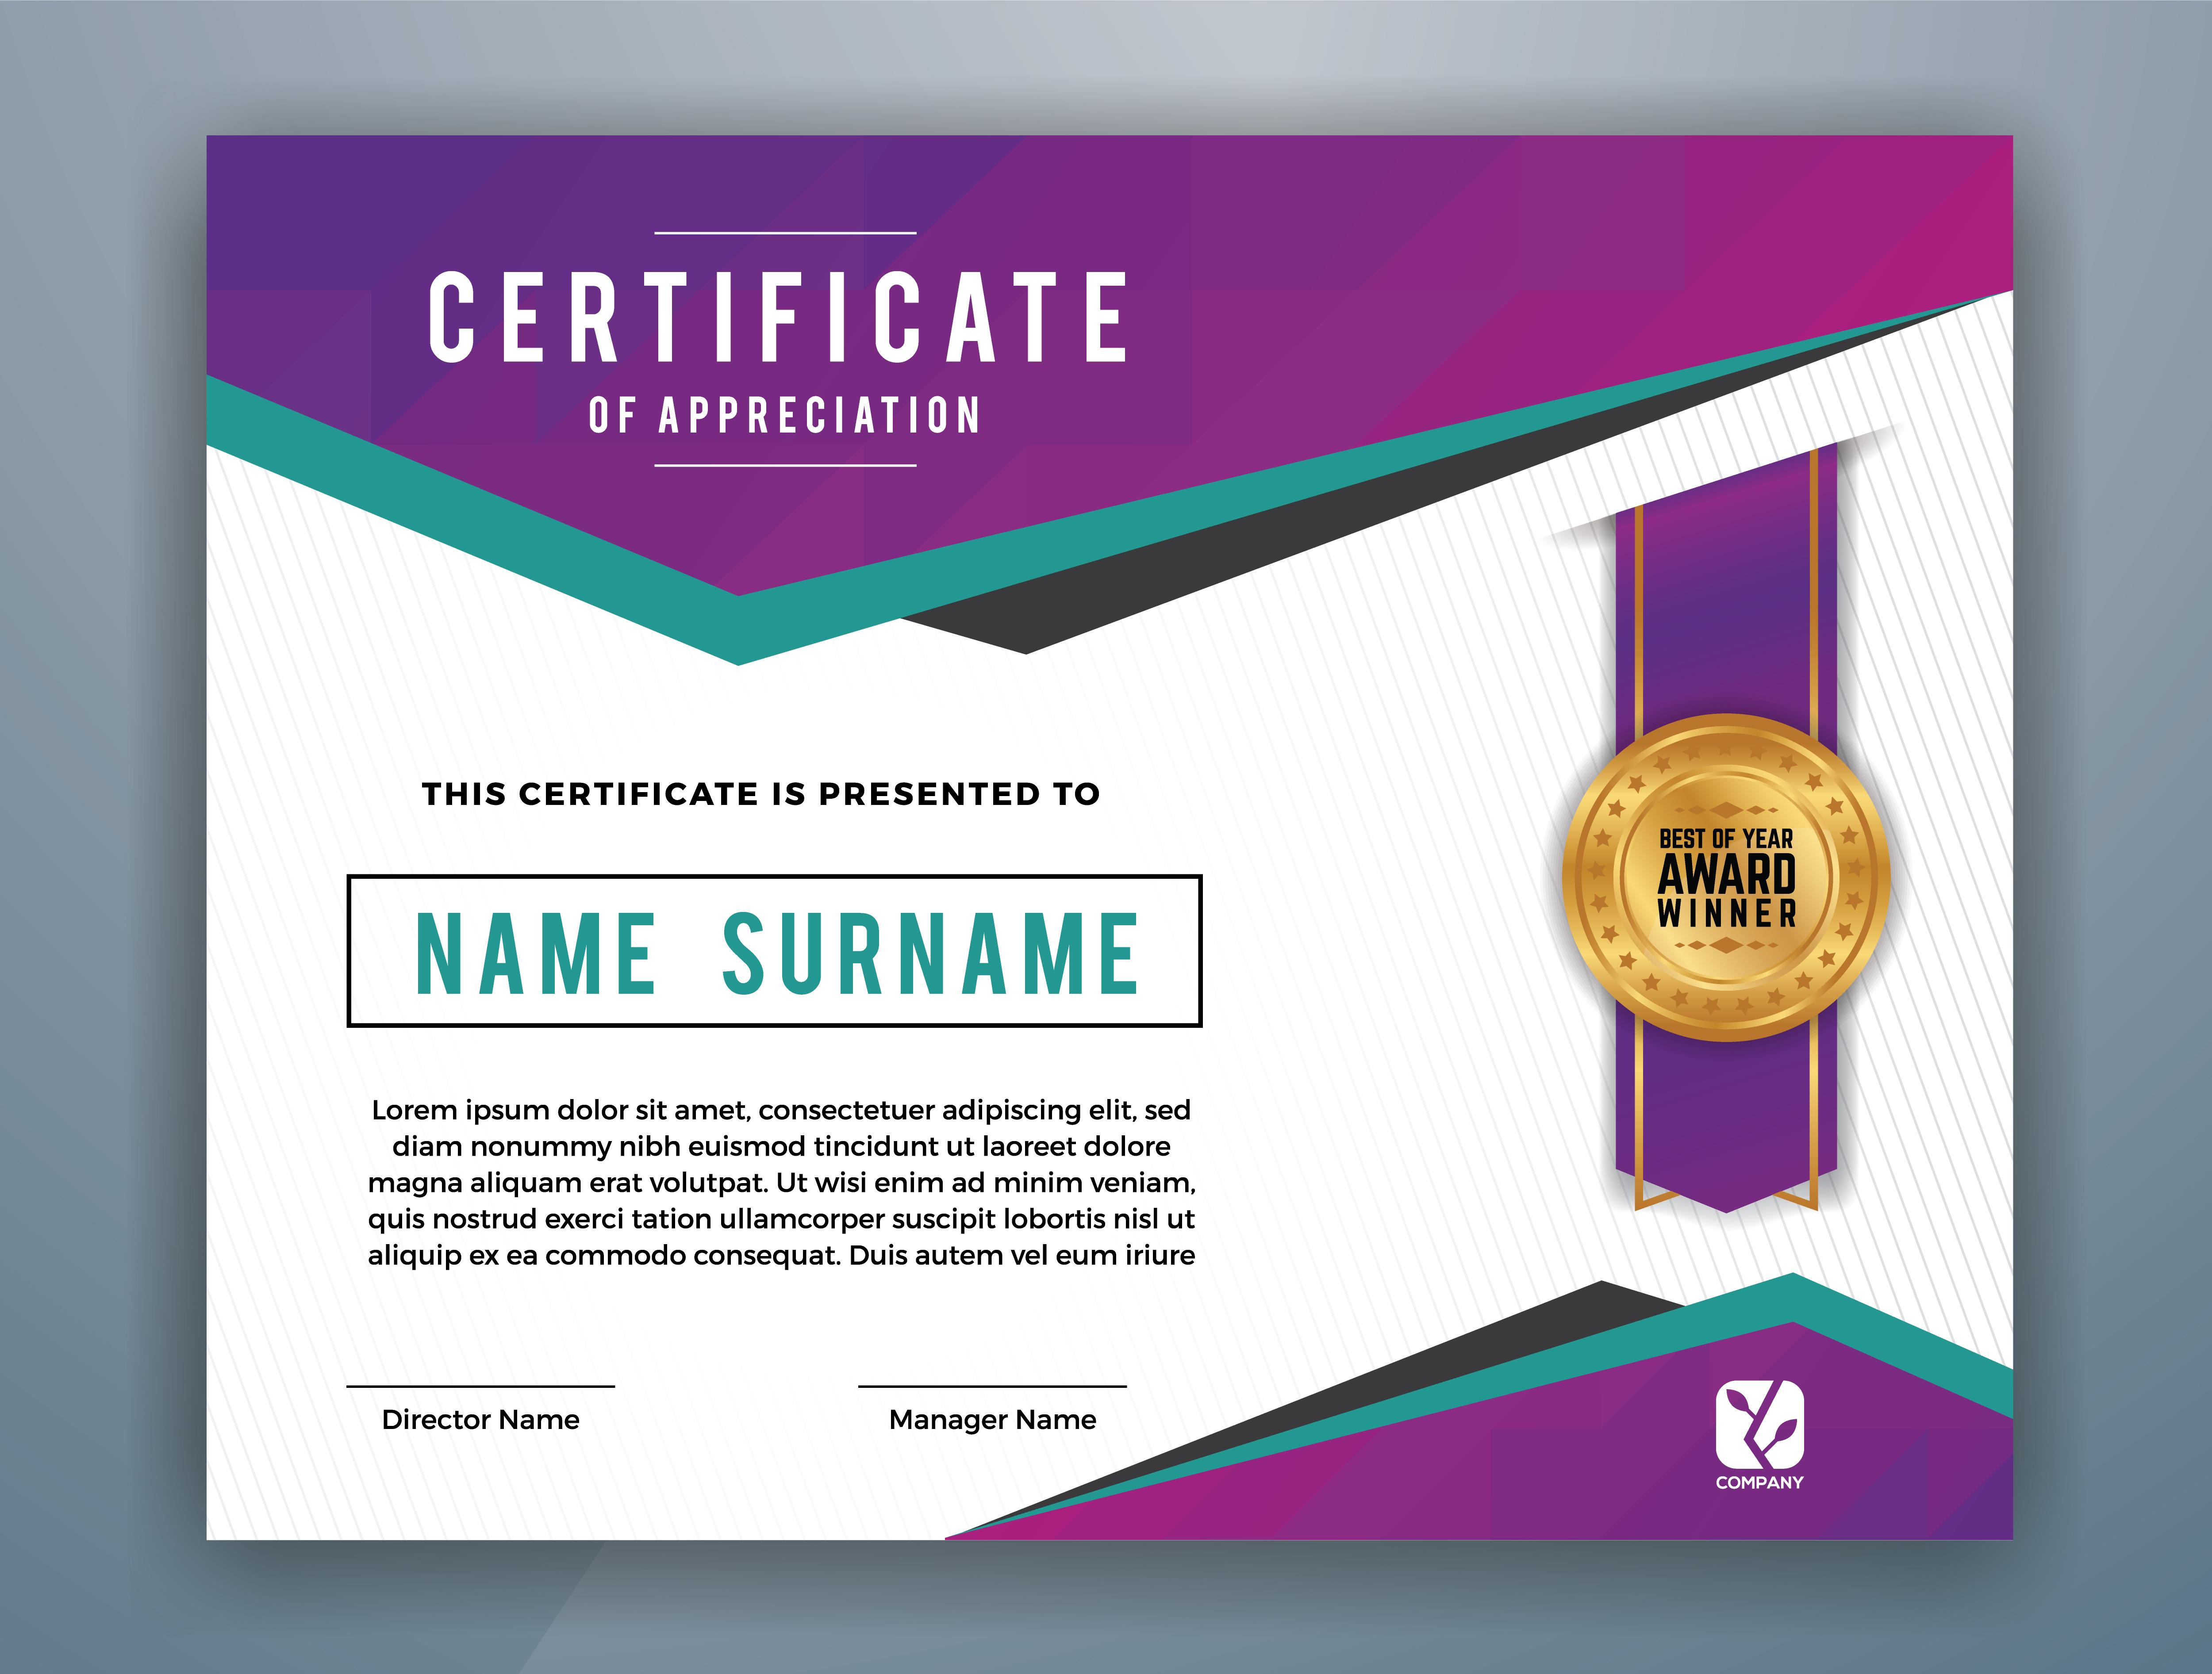 certificate template professional purple vector multipurpose modern abstract illustration premium graduation banner vecteezy graphics related